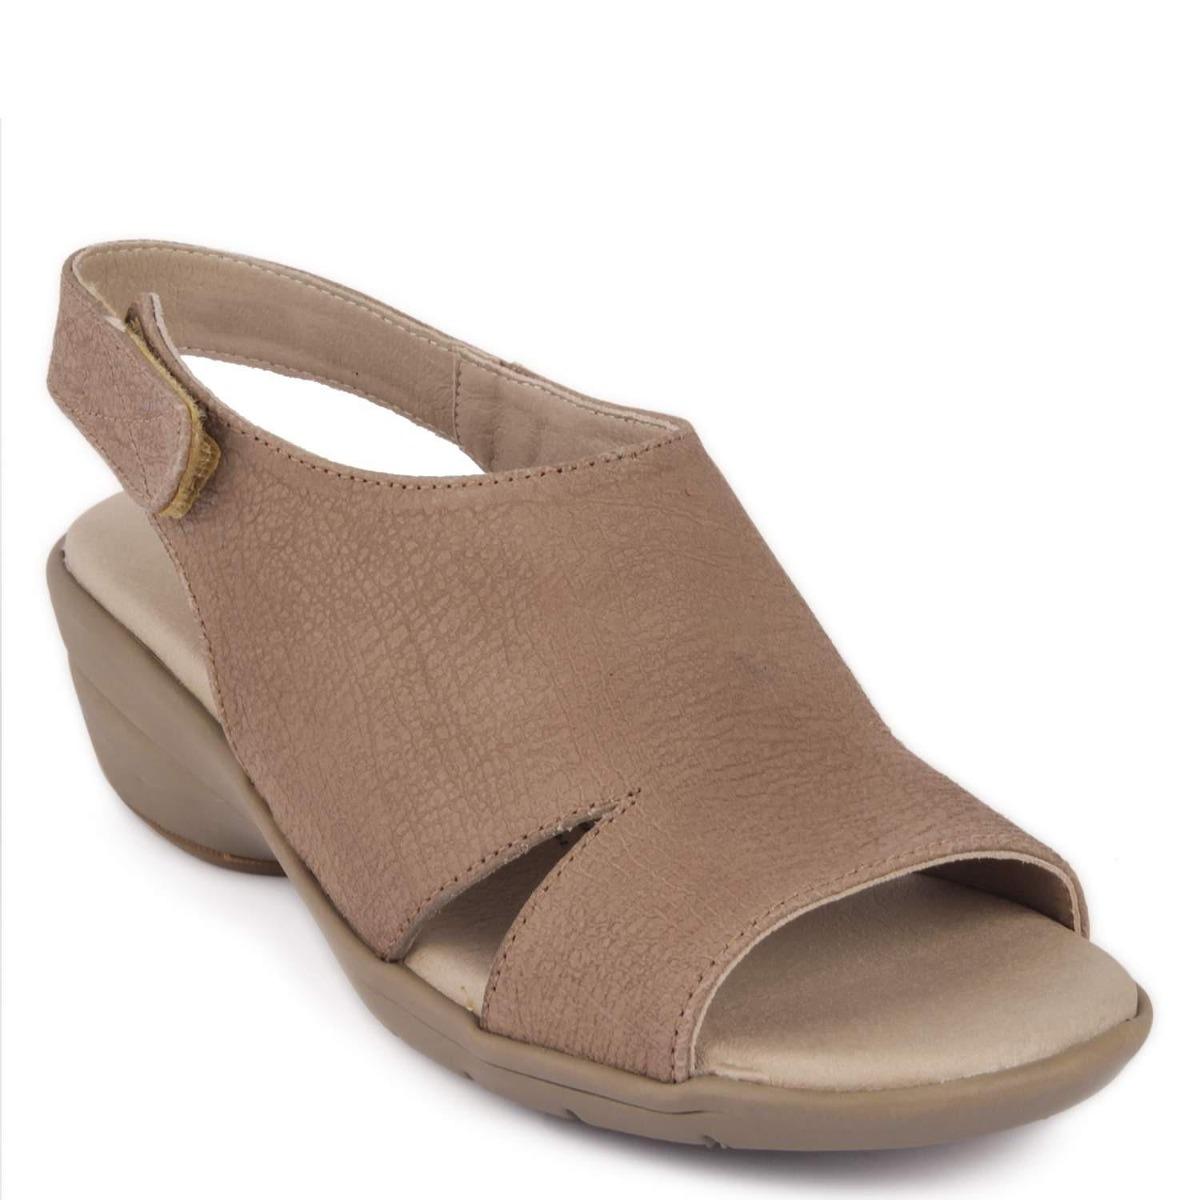 ce6b34a84f7ca Sandalia Long Steps 16 Hrs Mujer Camel - M646 -   49.990 en Mercado ...